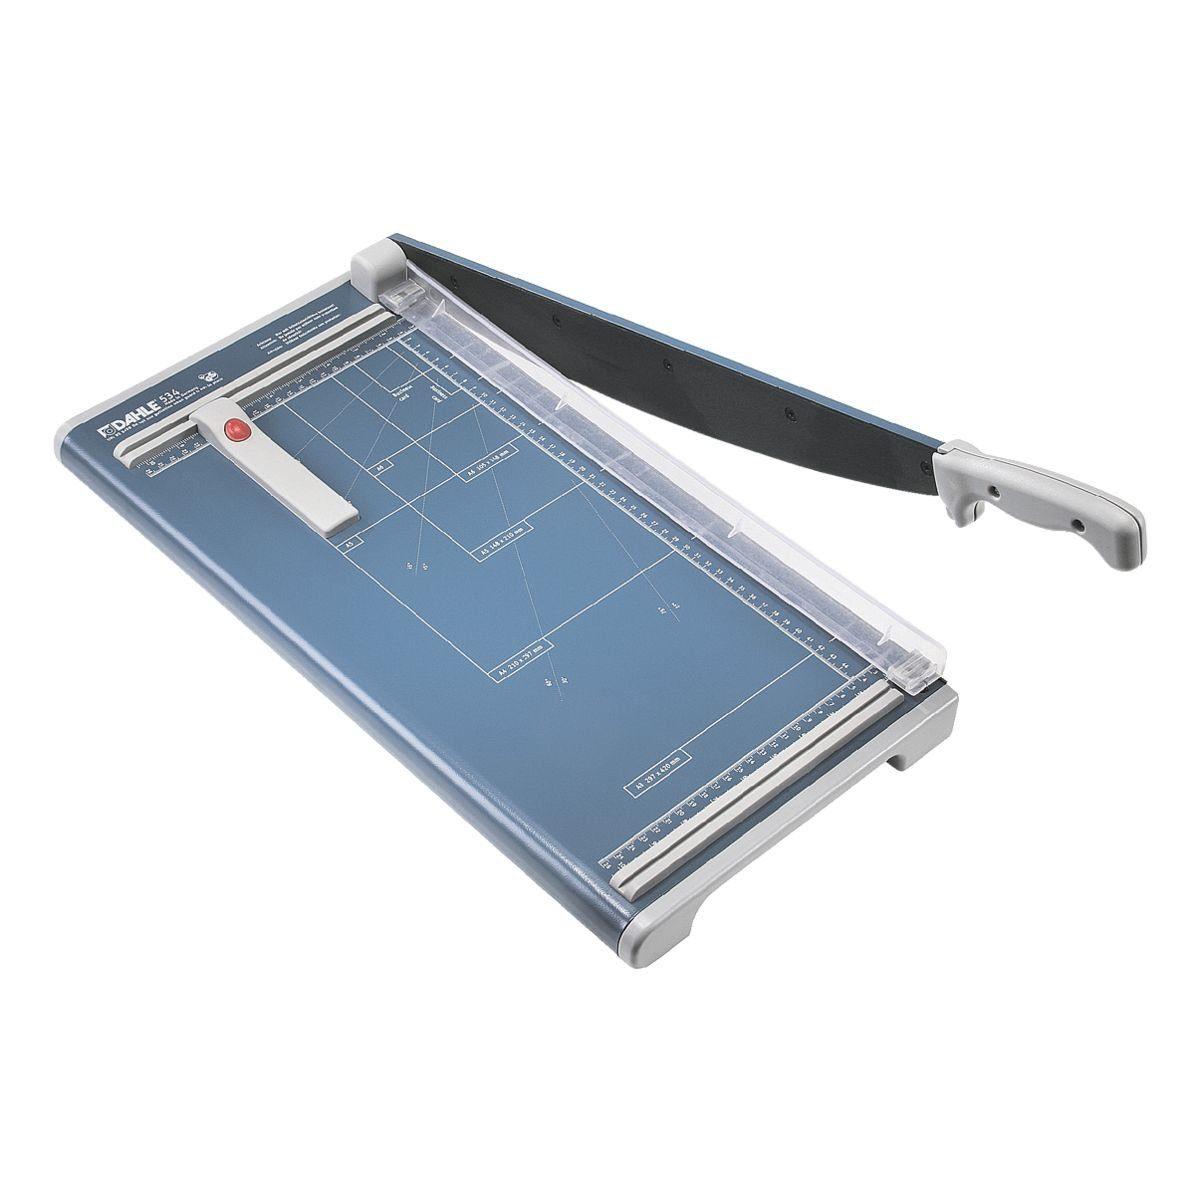 DAHLE® Hebel-Schneidemaschine 534 blau 460 mm 15 Blatt